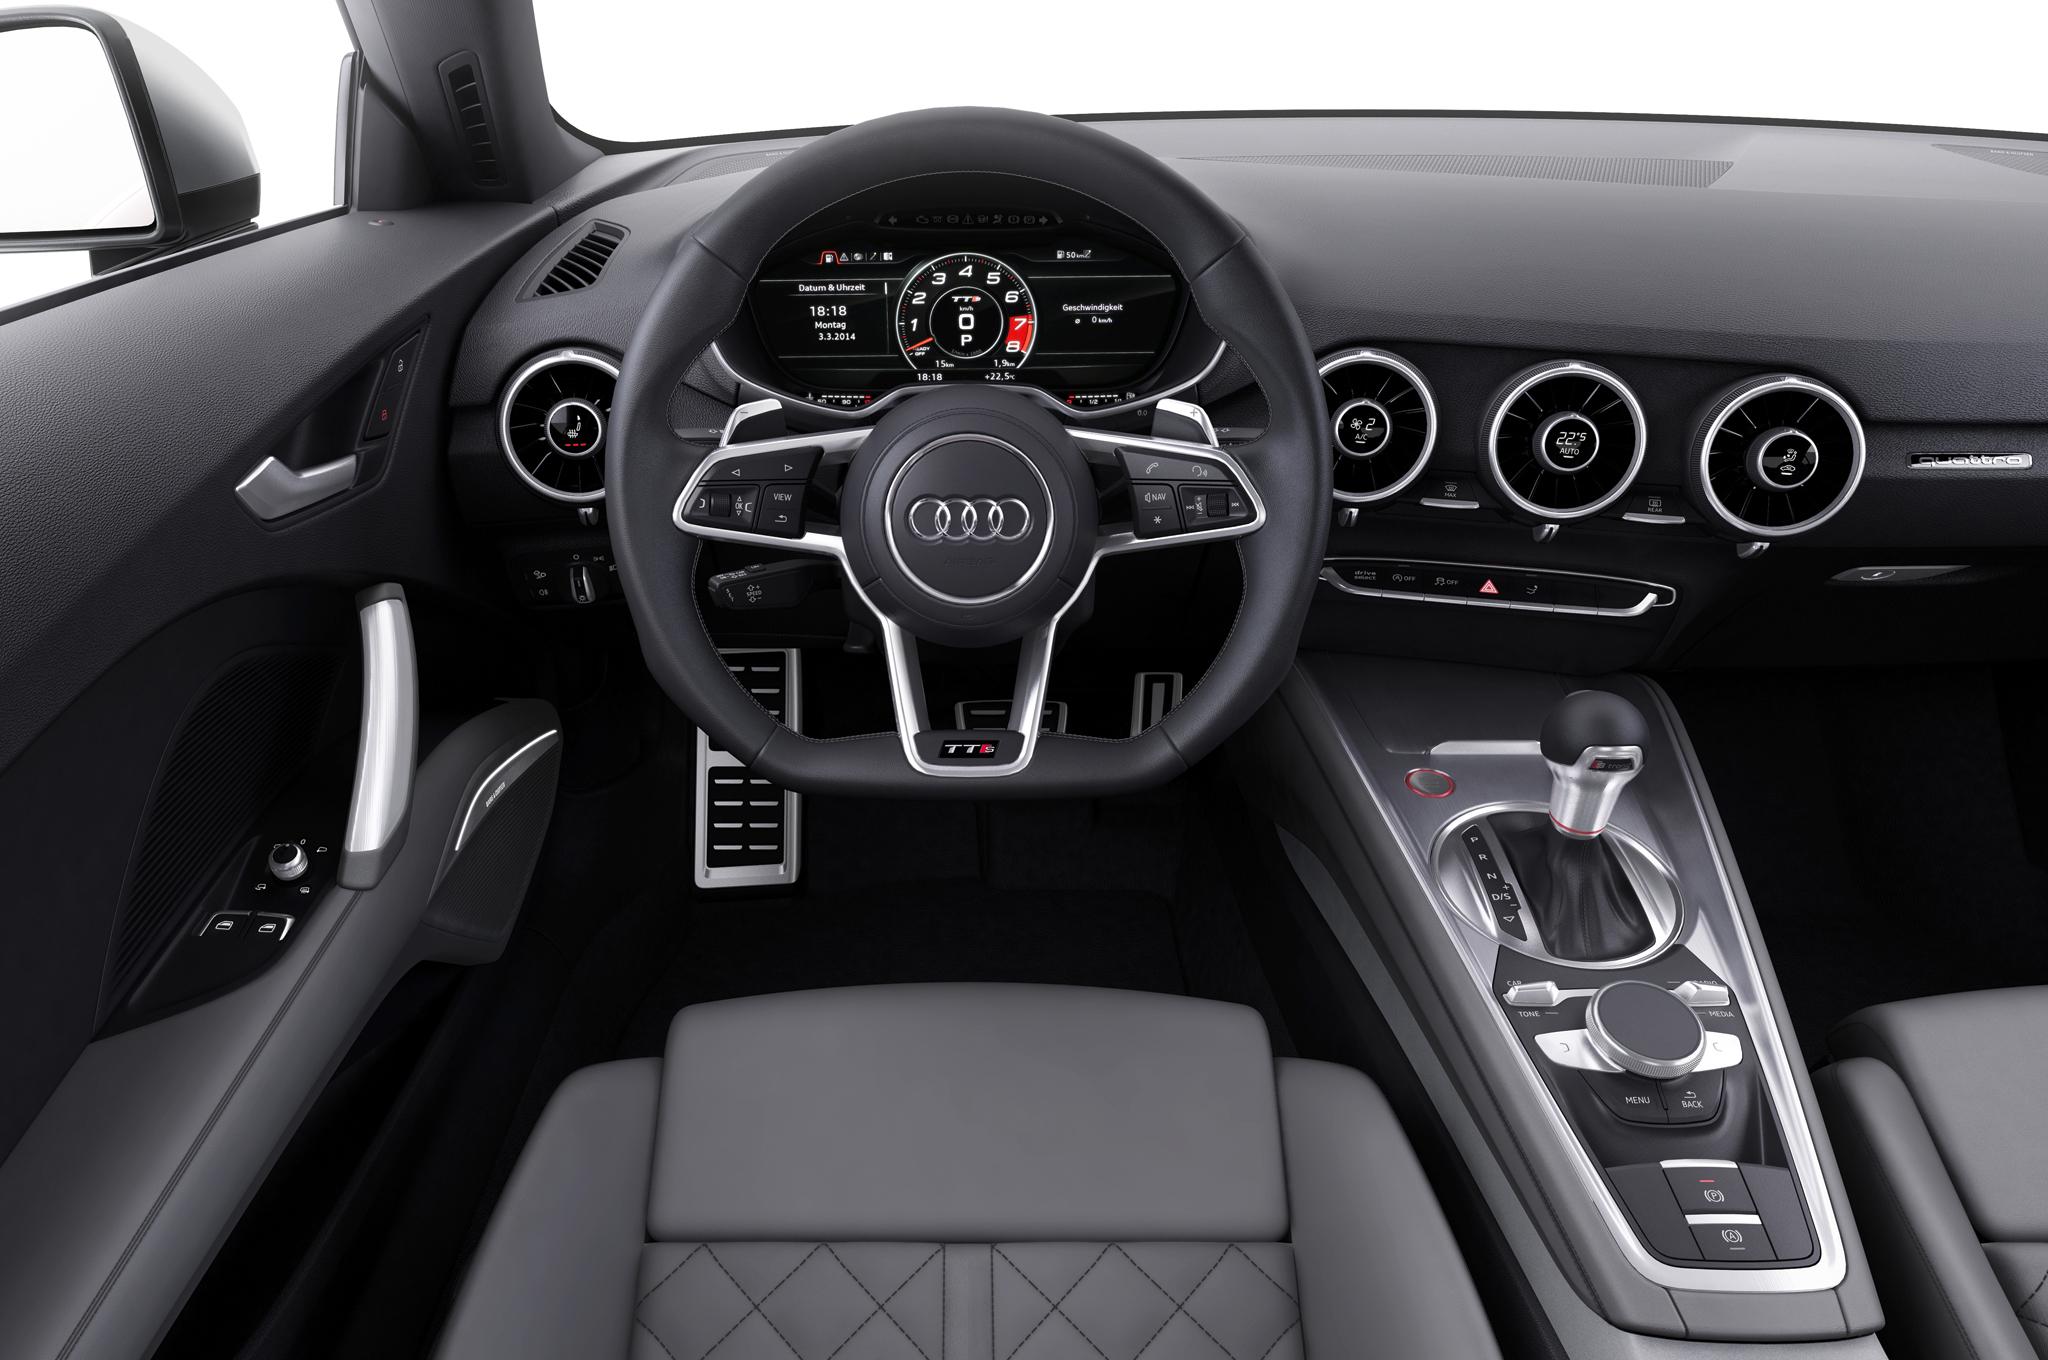 2016 Audi TT Interior Cockpit and Dashboard